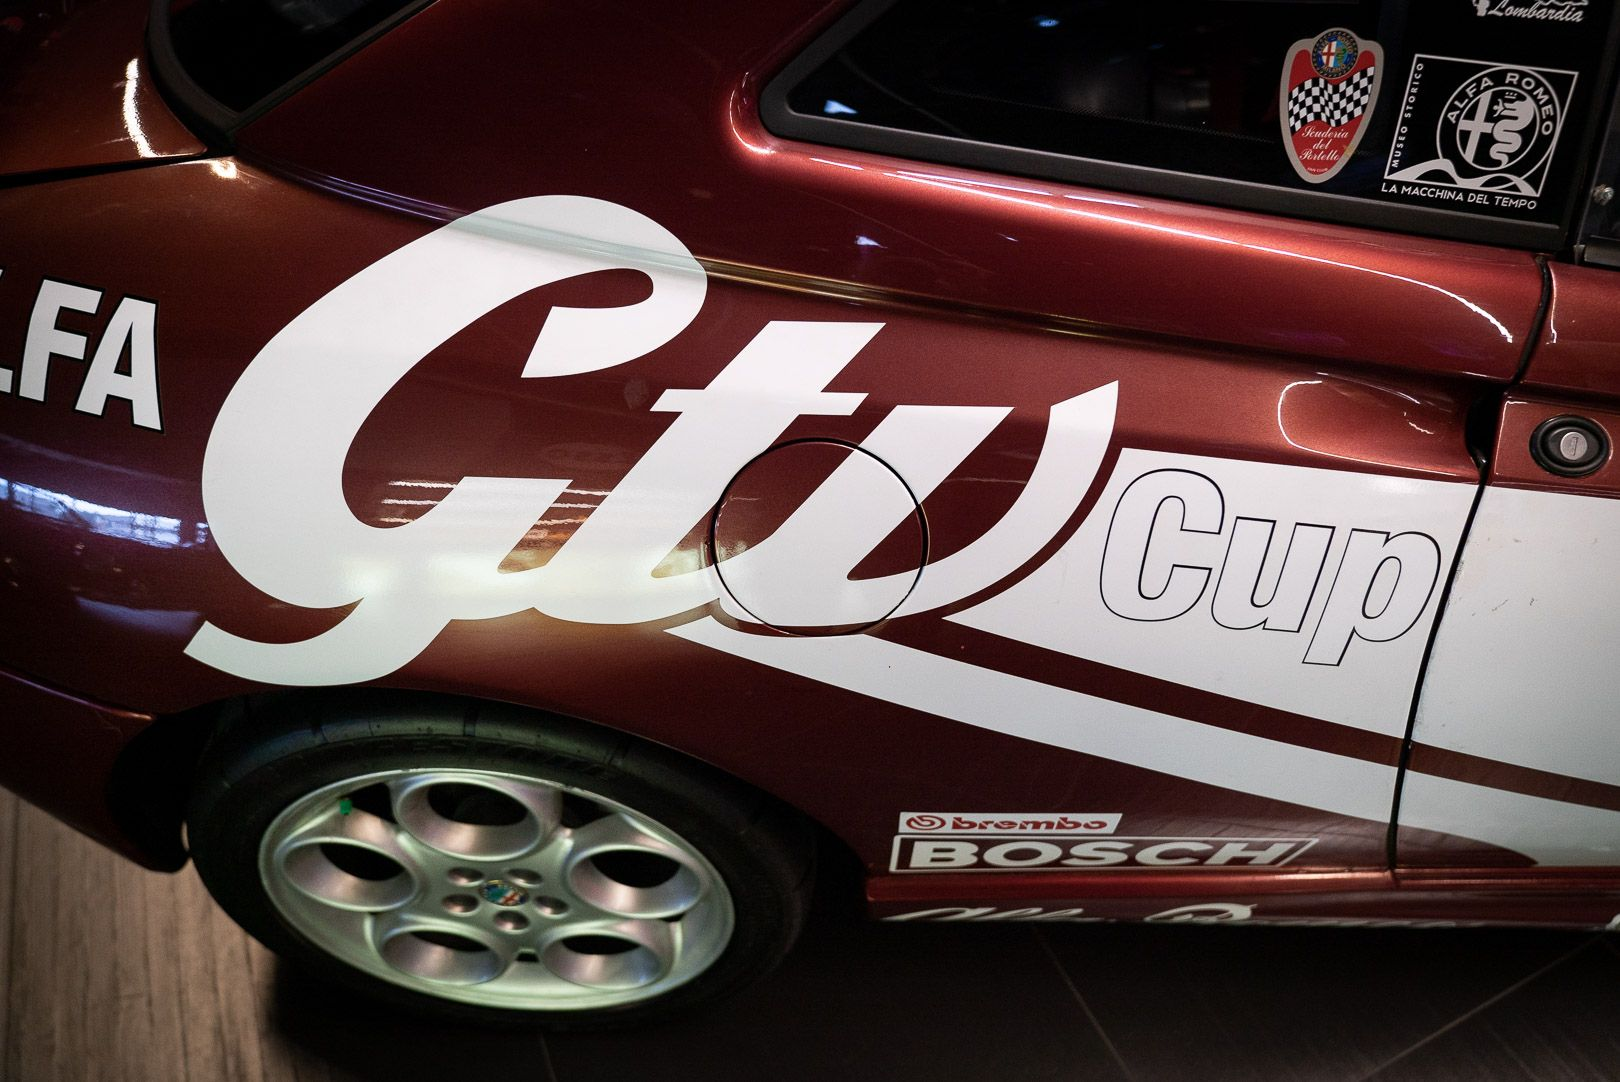 1995 Alfa Romeo GTV 2.0 V6 Turbo Cup Replica 59923